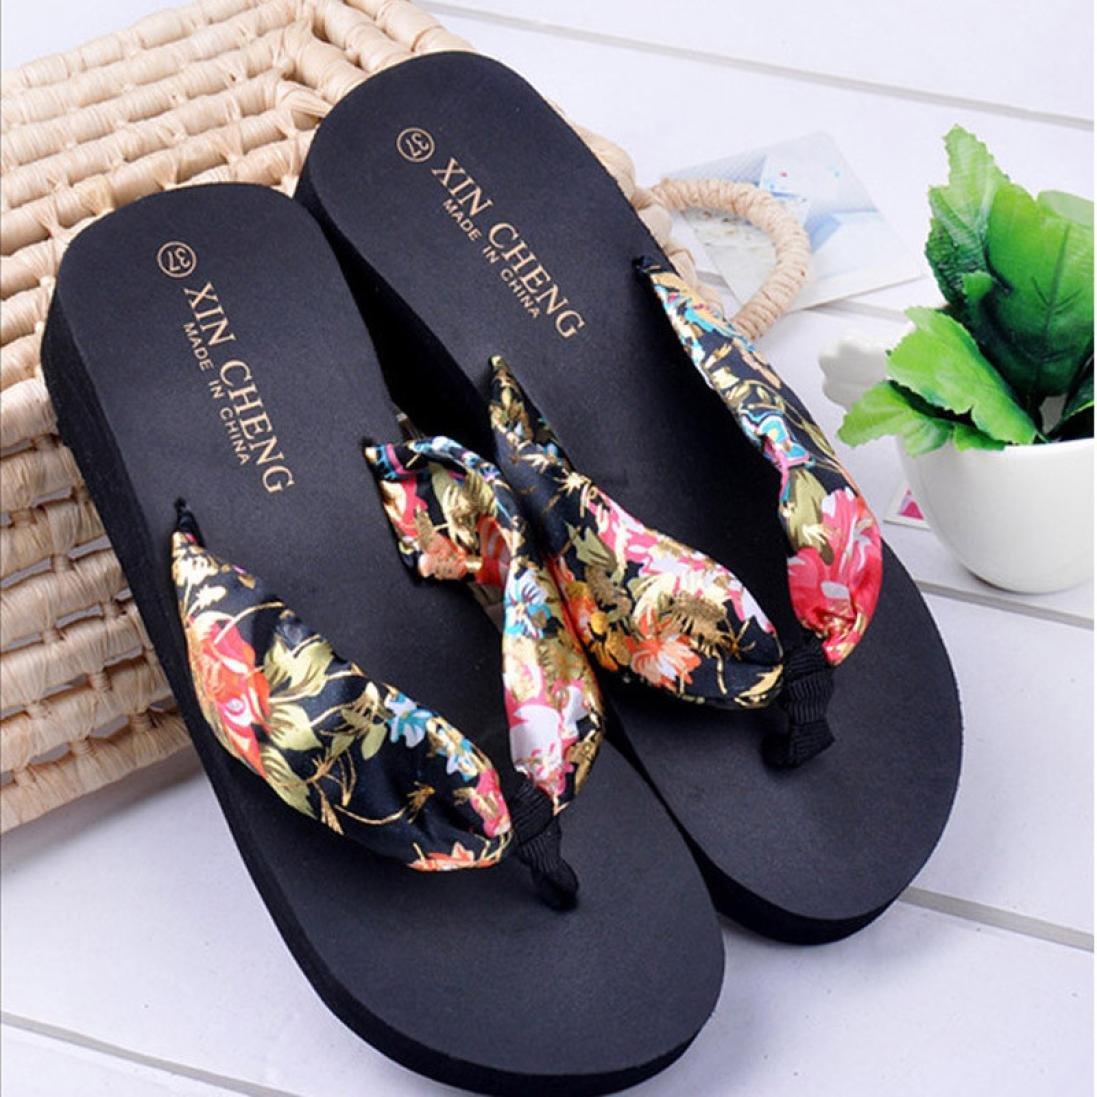 Women Flip-Flops 2018,Todaies Women Bohemia Floral Beach Sandals Wedge Platform Thongs Slippers Flip Flops 3 Colors (Size 36, Black)